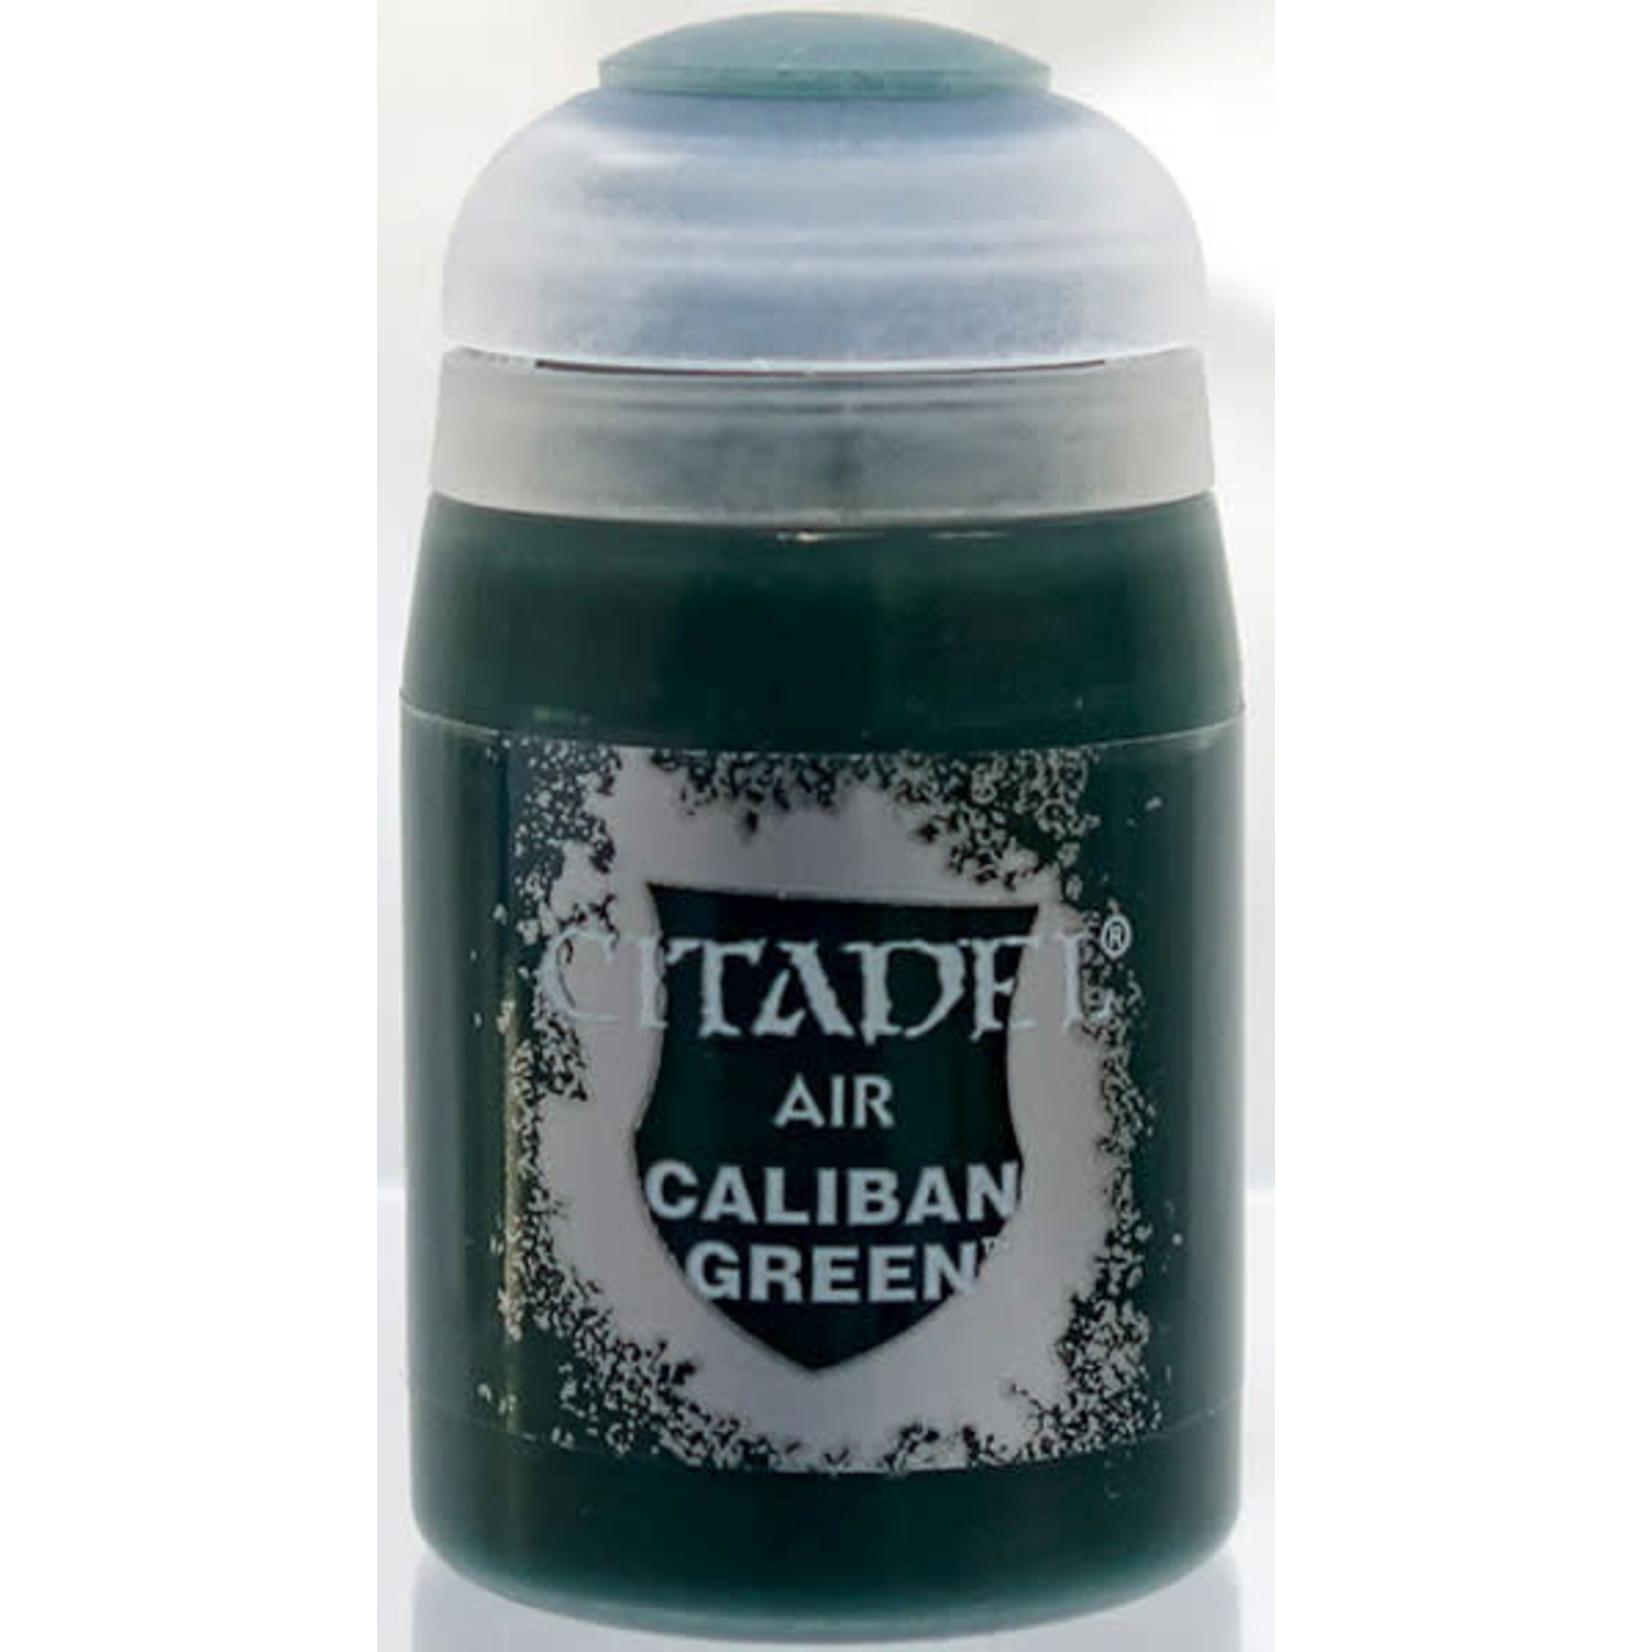 Games Workshop Citadel Paint: Caliban Green Air (24 ml)